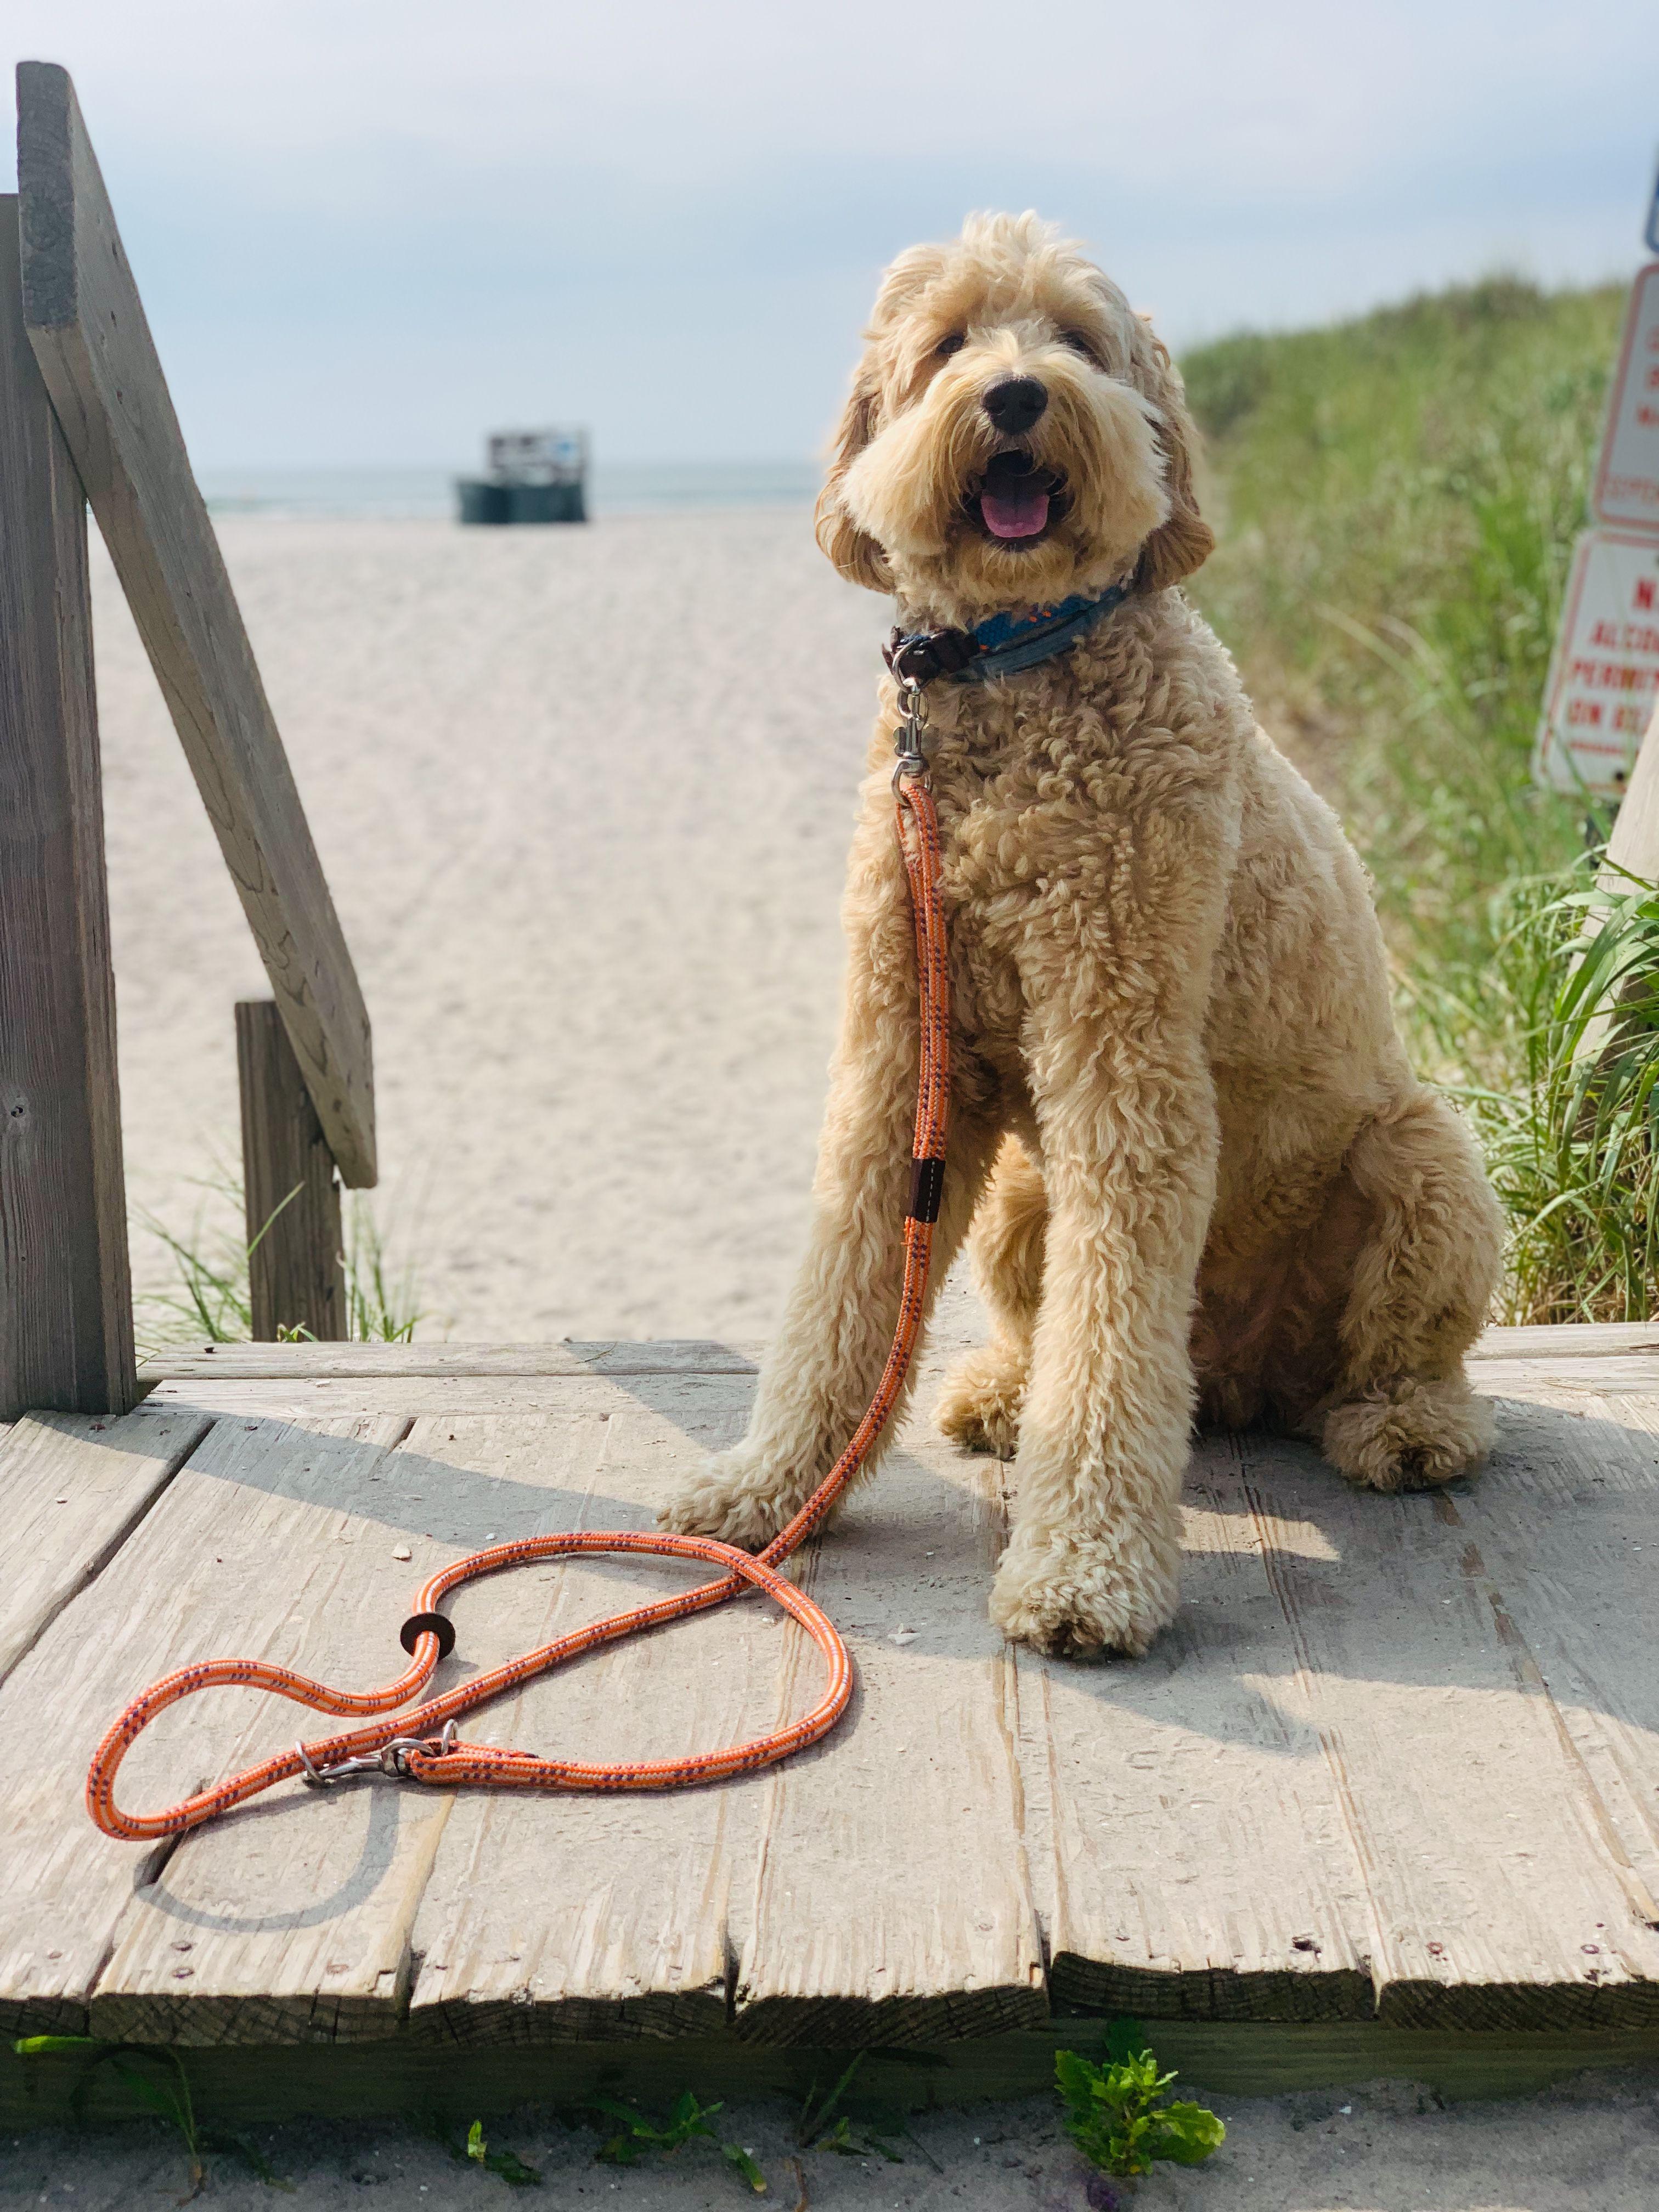 Rope Leash Dog Leash Dog Beach Cute Dogs